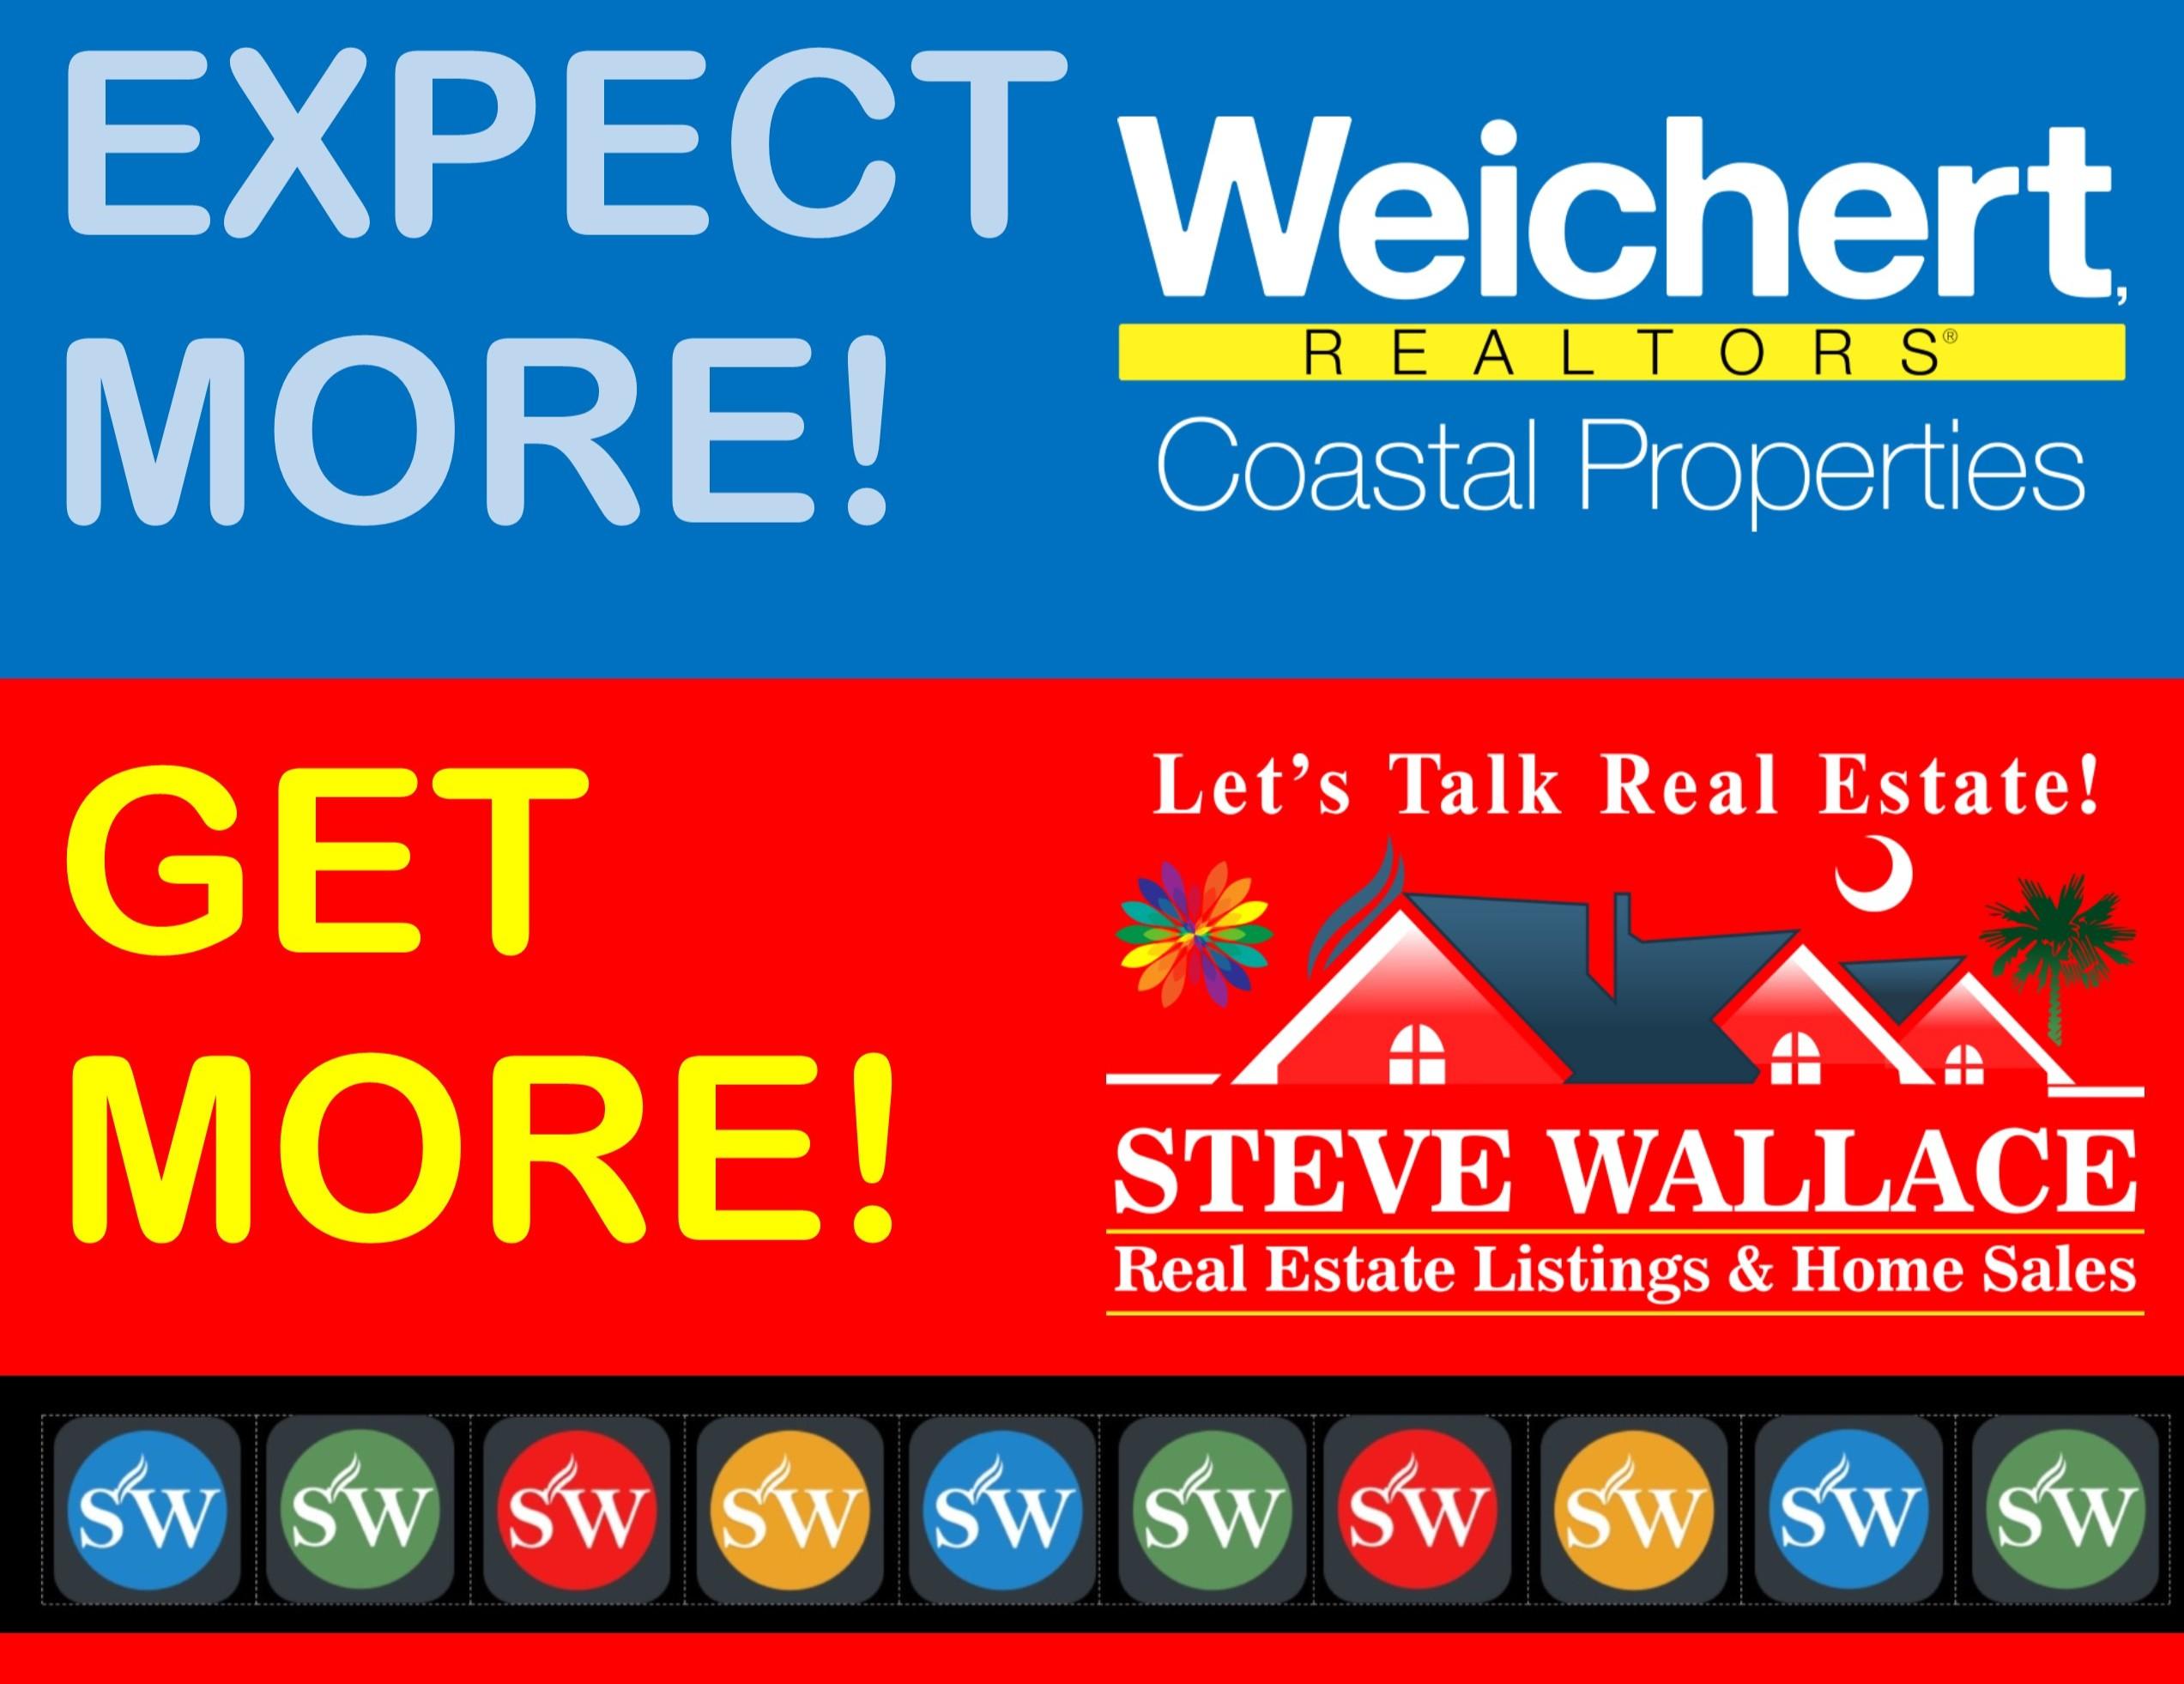 Buy a Home, Steve Wallace, REALTOR, South Carolina, Bluffton, Sun City, Hilton Head, Okatie